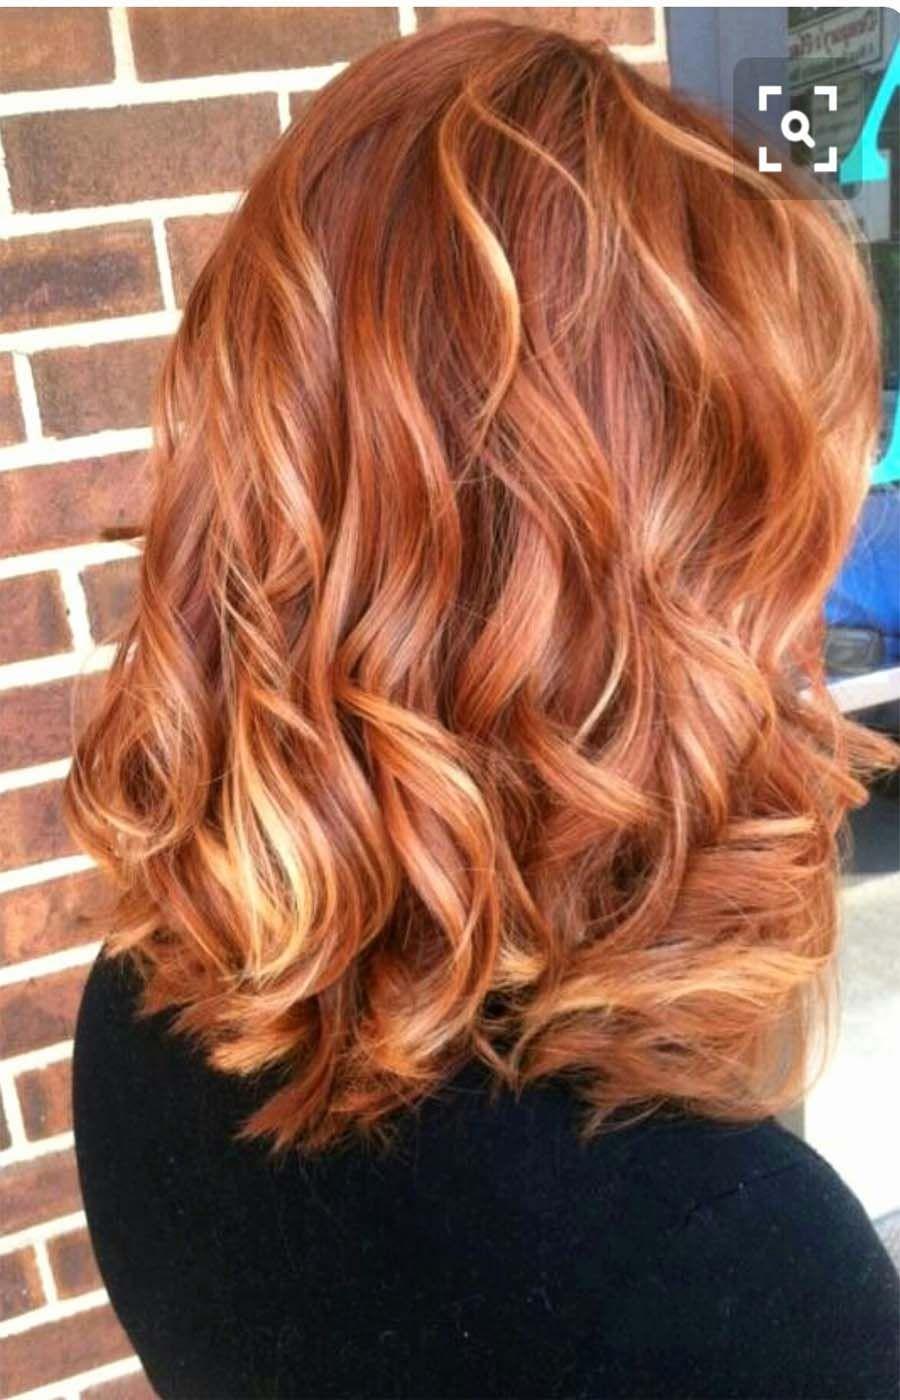 Copper medium hair color idea 2019   Ginger hair color, Cute blonde hair, Hair color for black hair